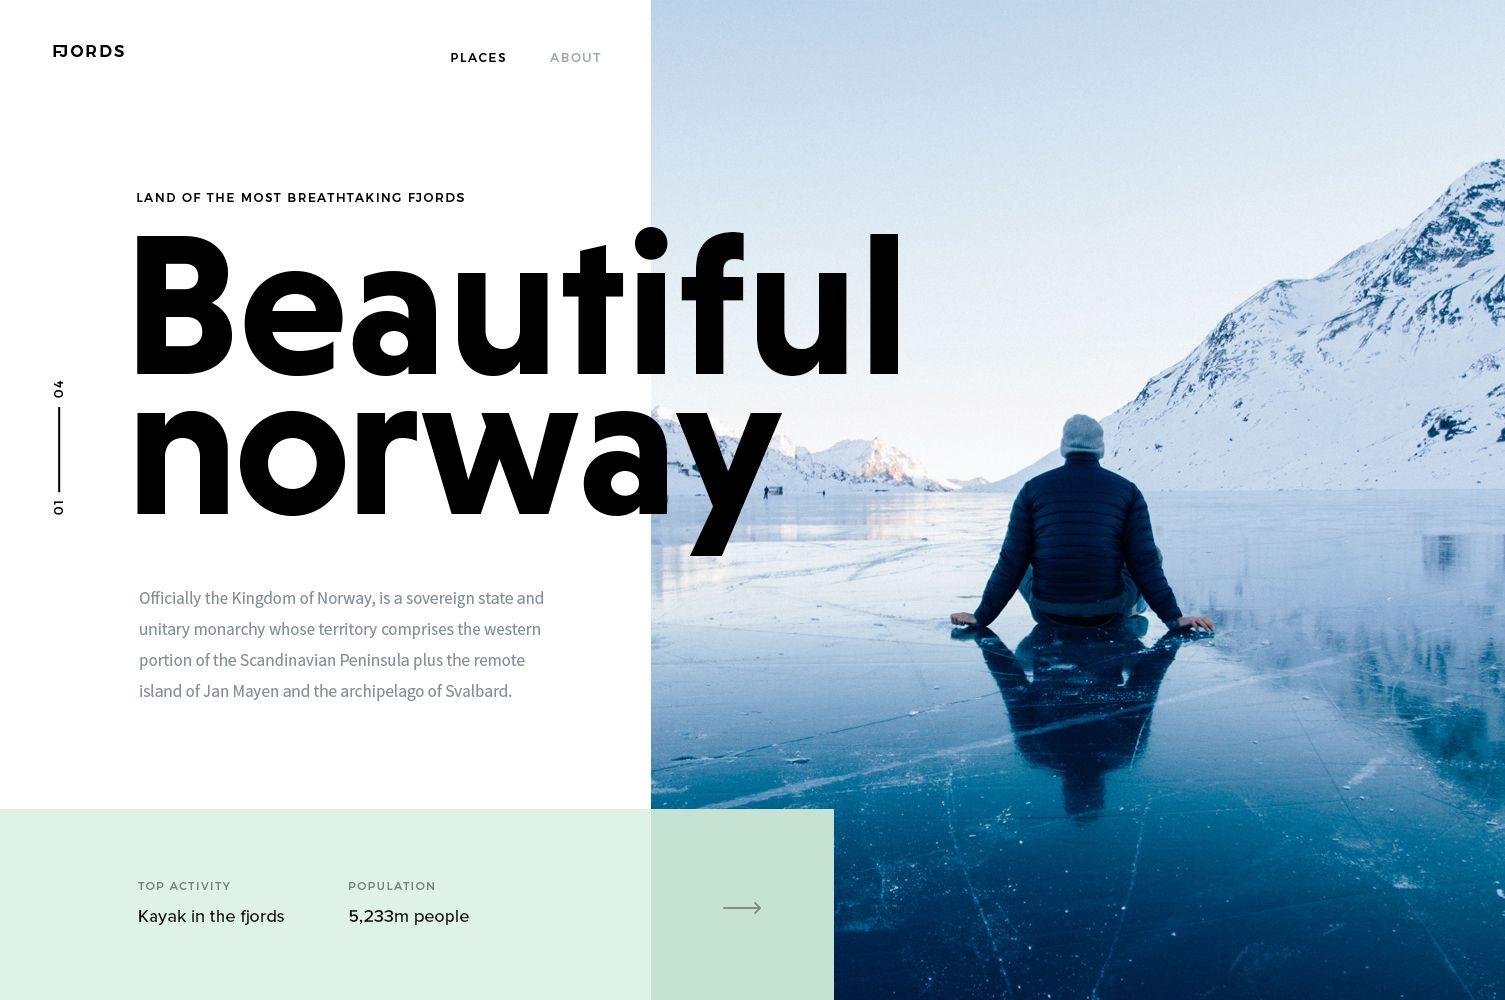 Norway Web Design Trends Web Layout Design Interactive Design